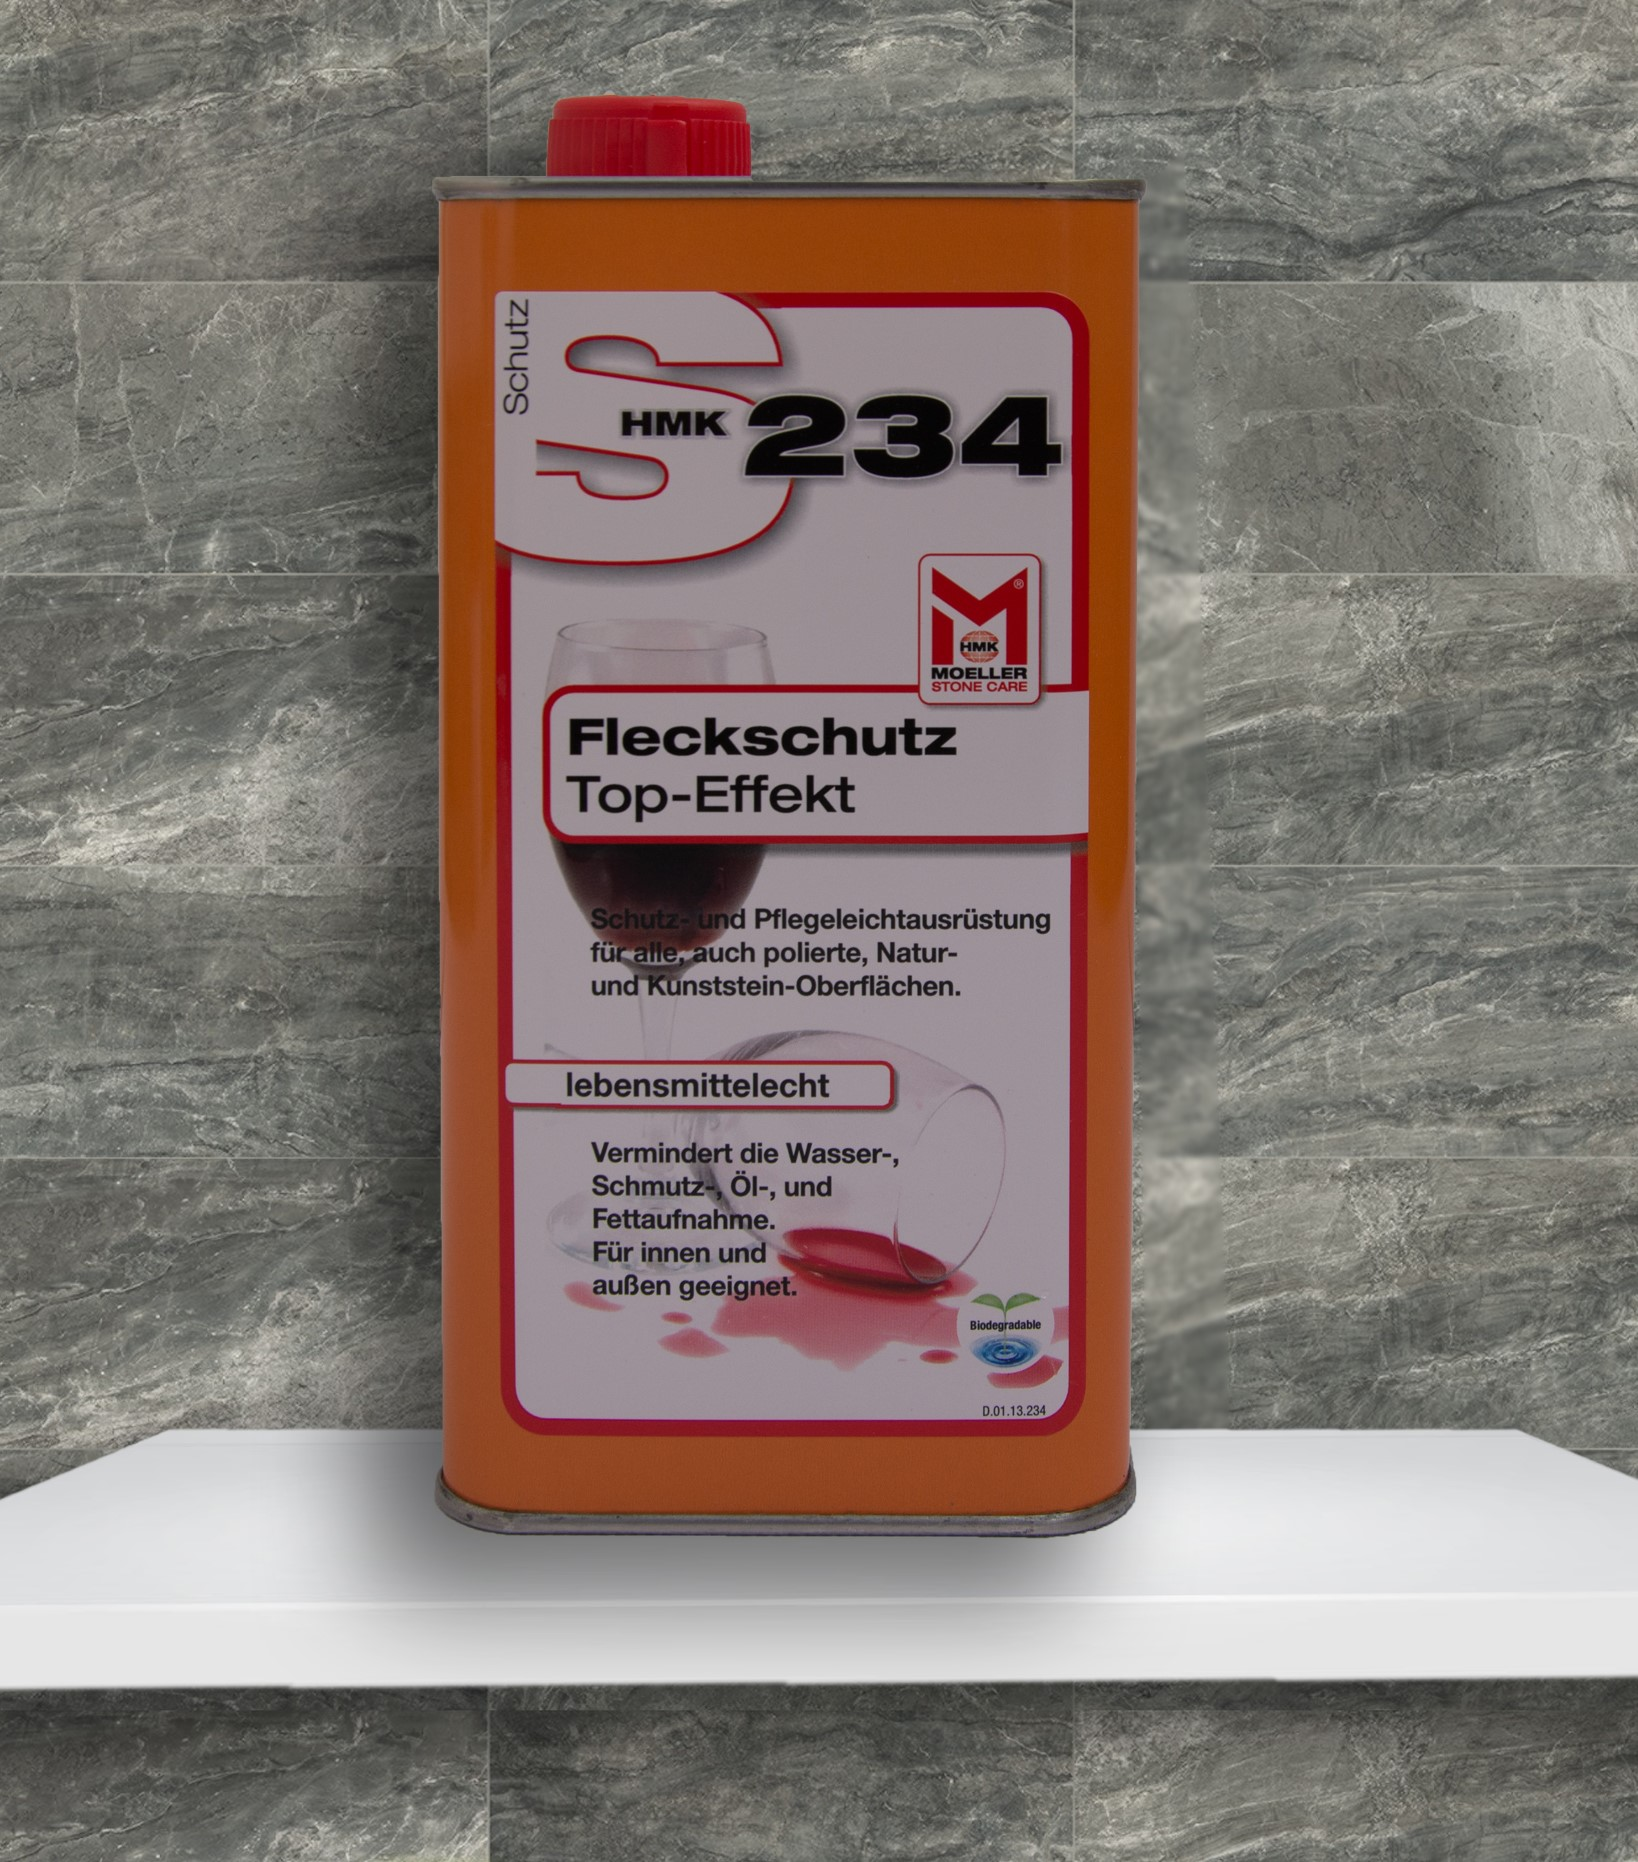 HMK S234 Fleckschutz - Top-Effekt